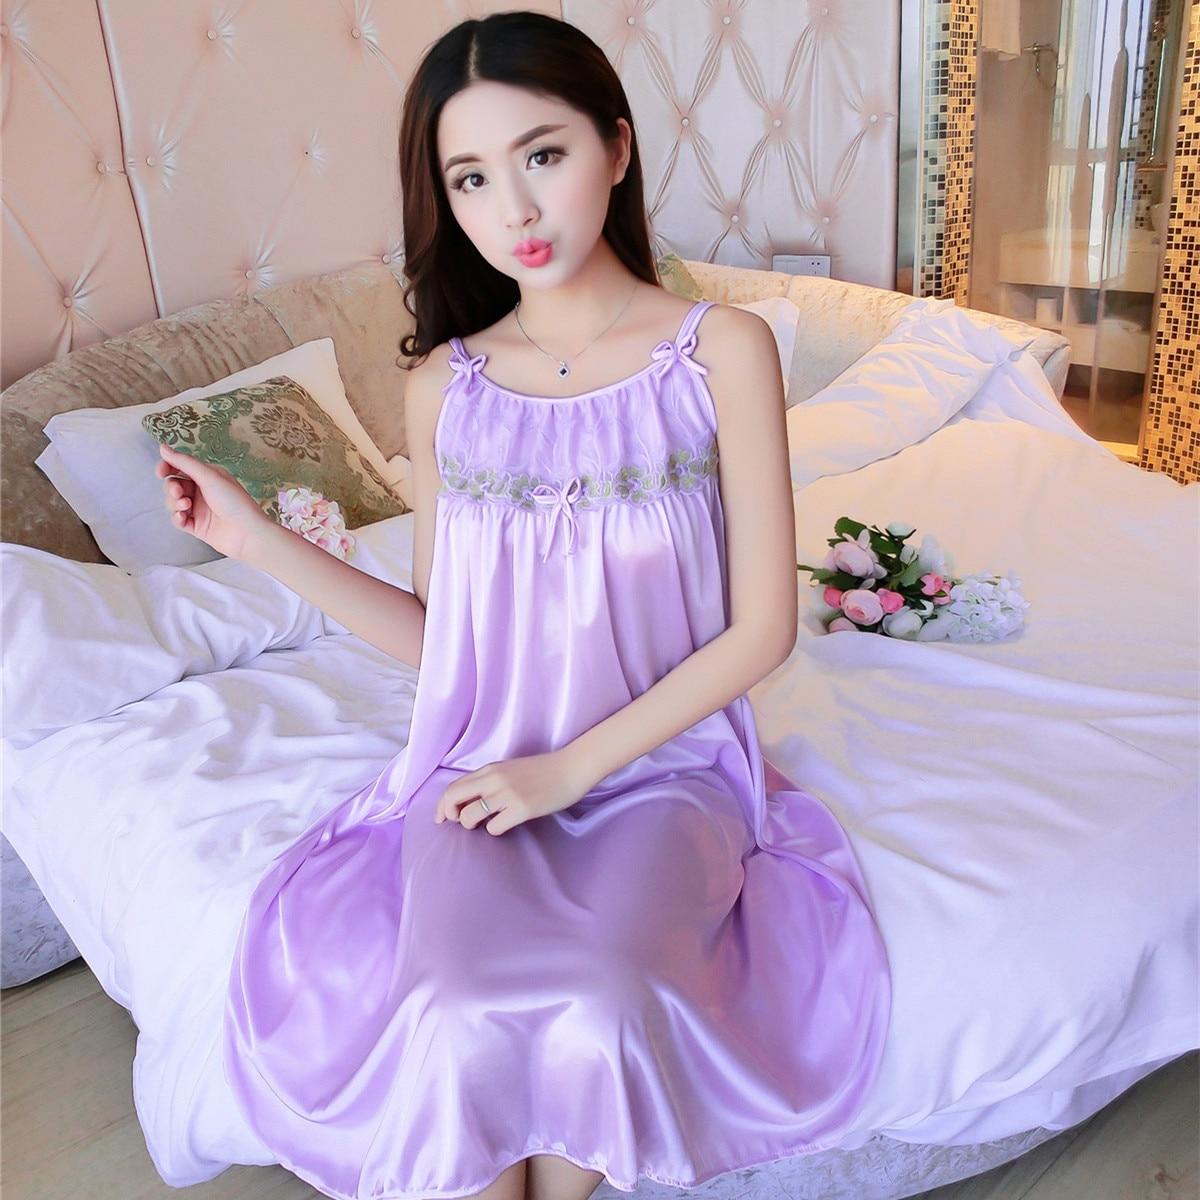 Summer Cute Temptation Viscose Pajamas WOMEN'S Tank Top-Imitated Silk Fabric Nightgown Silk-Home Wear